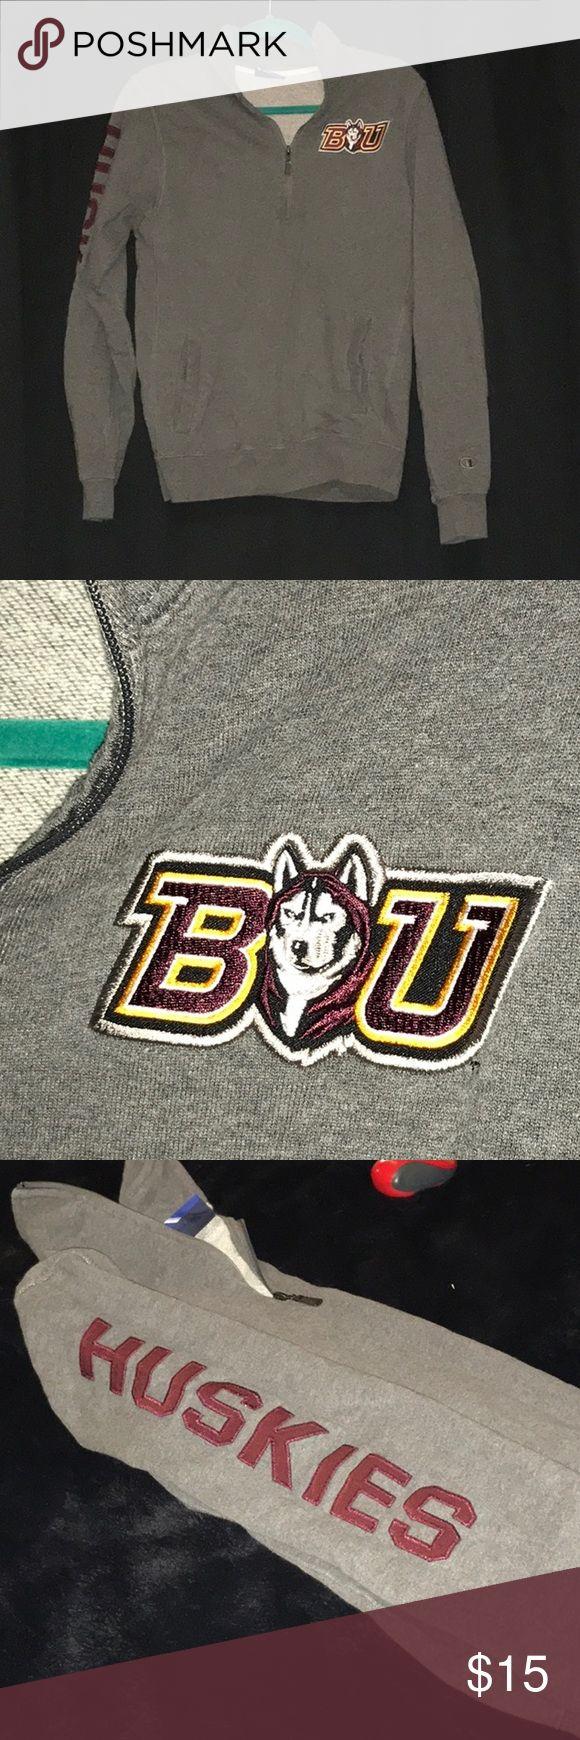 Bloomsburg university sweatshirt New condition Tops Sweatshirts & Hoodies